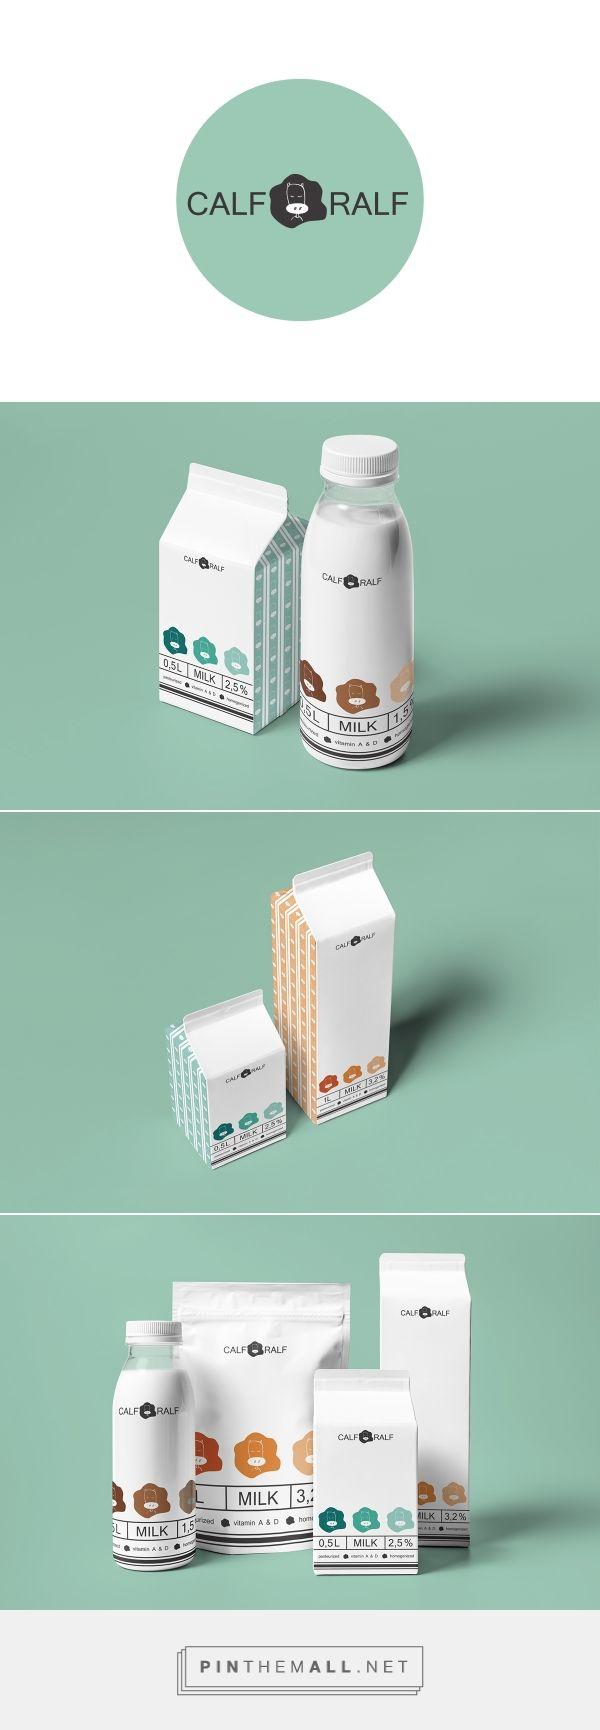 Calf Ralf on Behance by Katya Oposhnyanskaya Kiev, Ukraine curated by Packaging Diva PD. Really cute packaging design concept for milk.